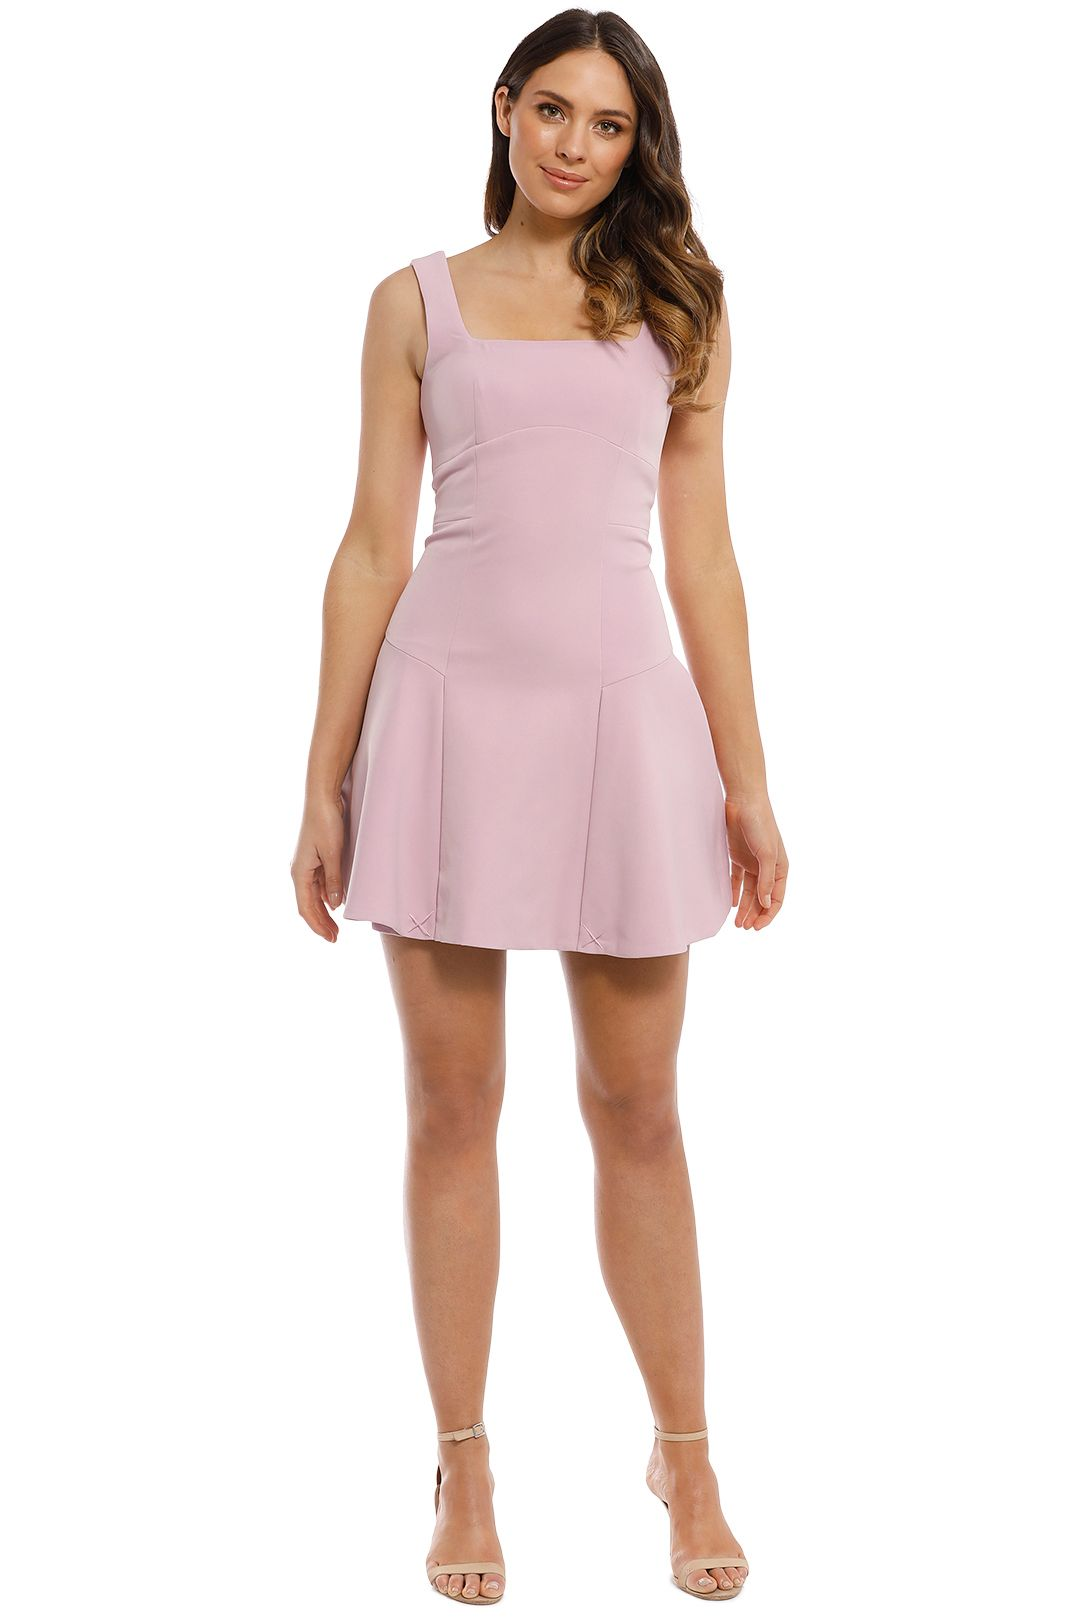 Elliatt - Pavia Dress - Blush - Front